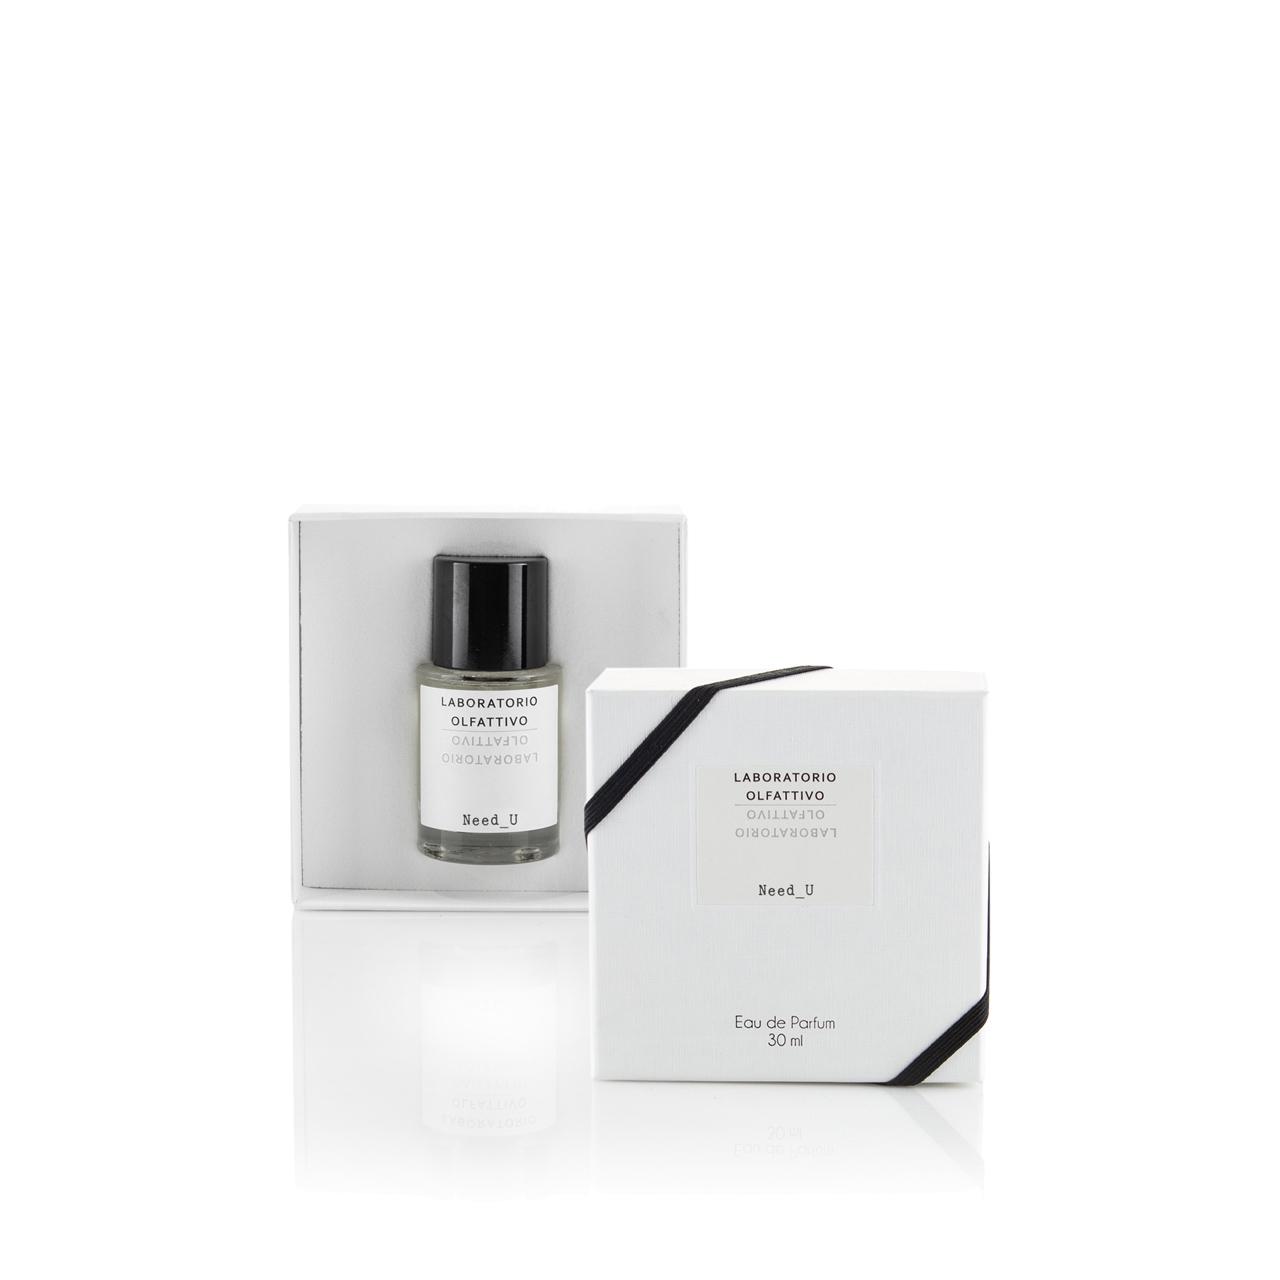 Need_U - Eau de Parfum